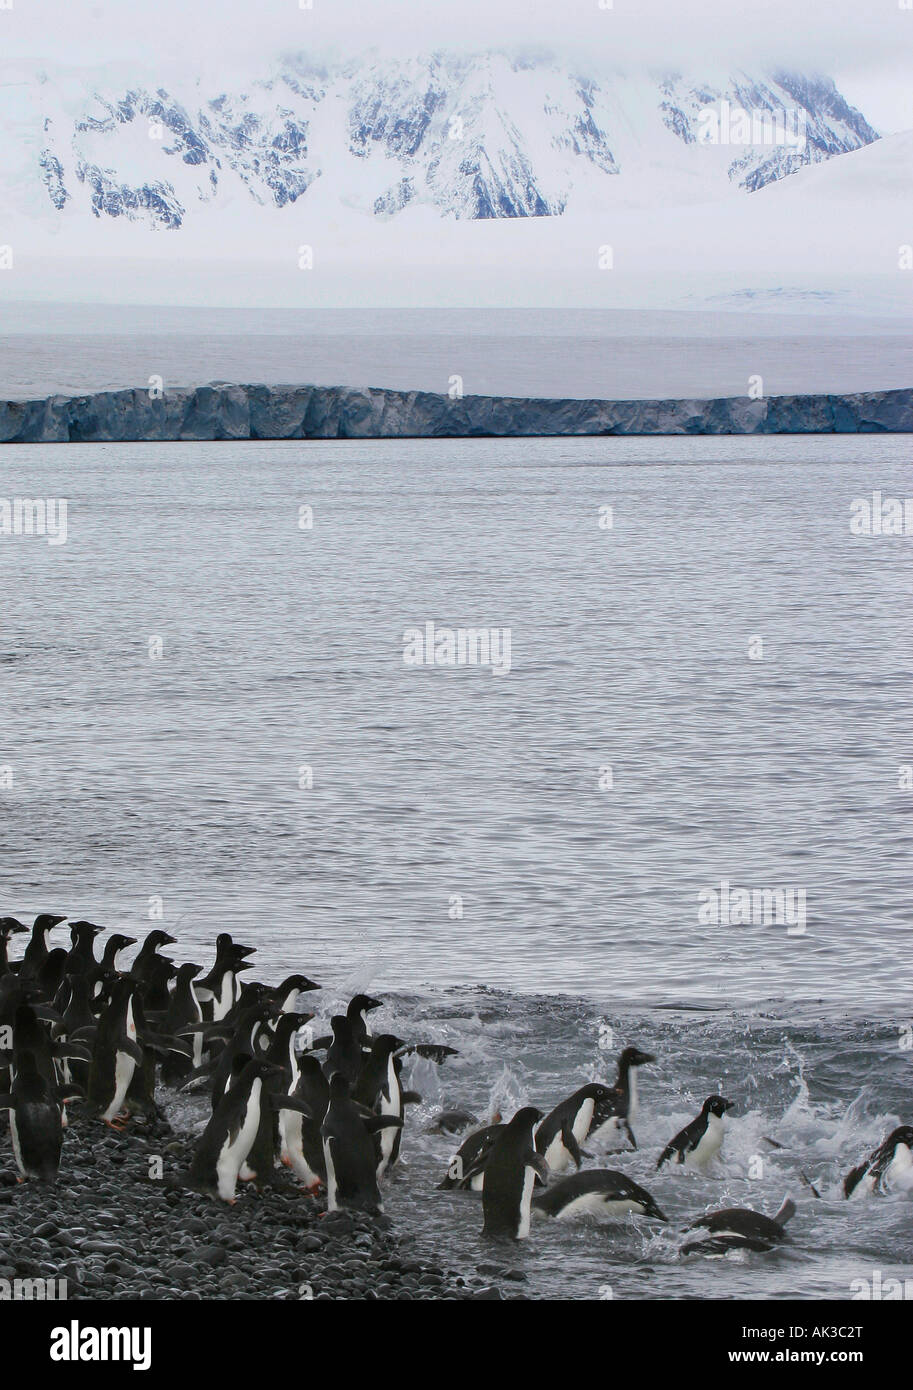 Adelie penguins entering water at Brown Bluff, Antartica - Stock Image